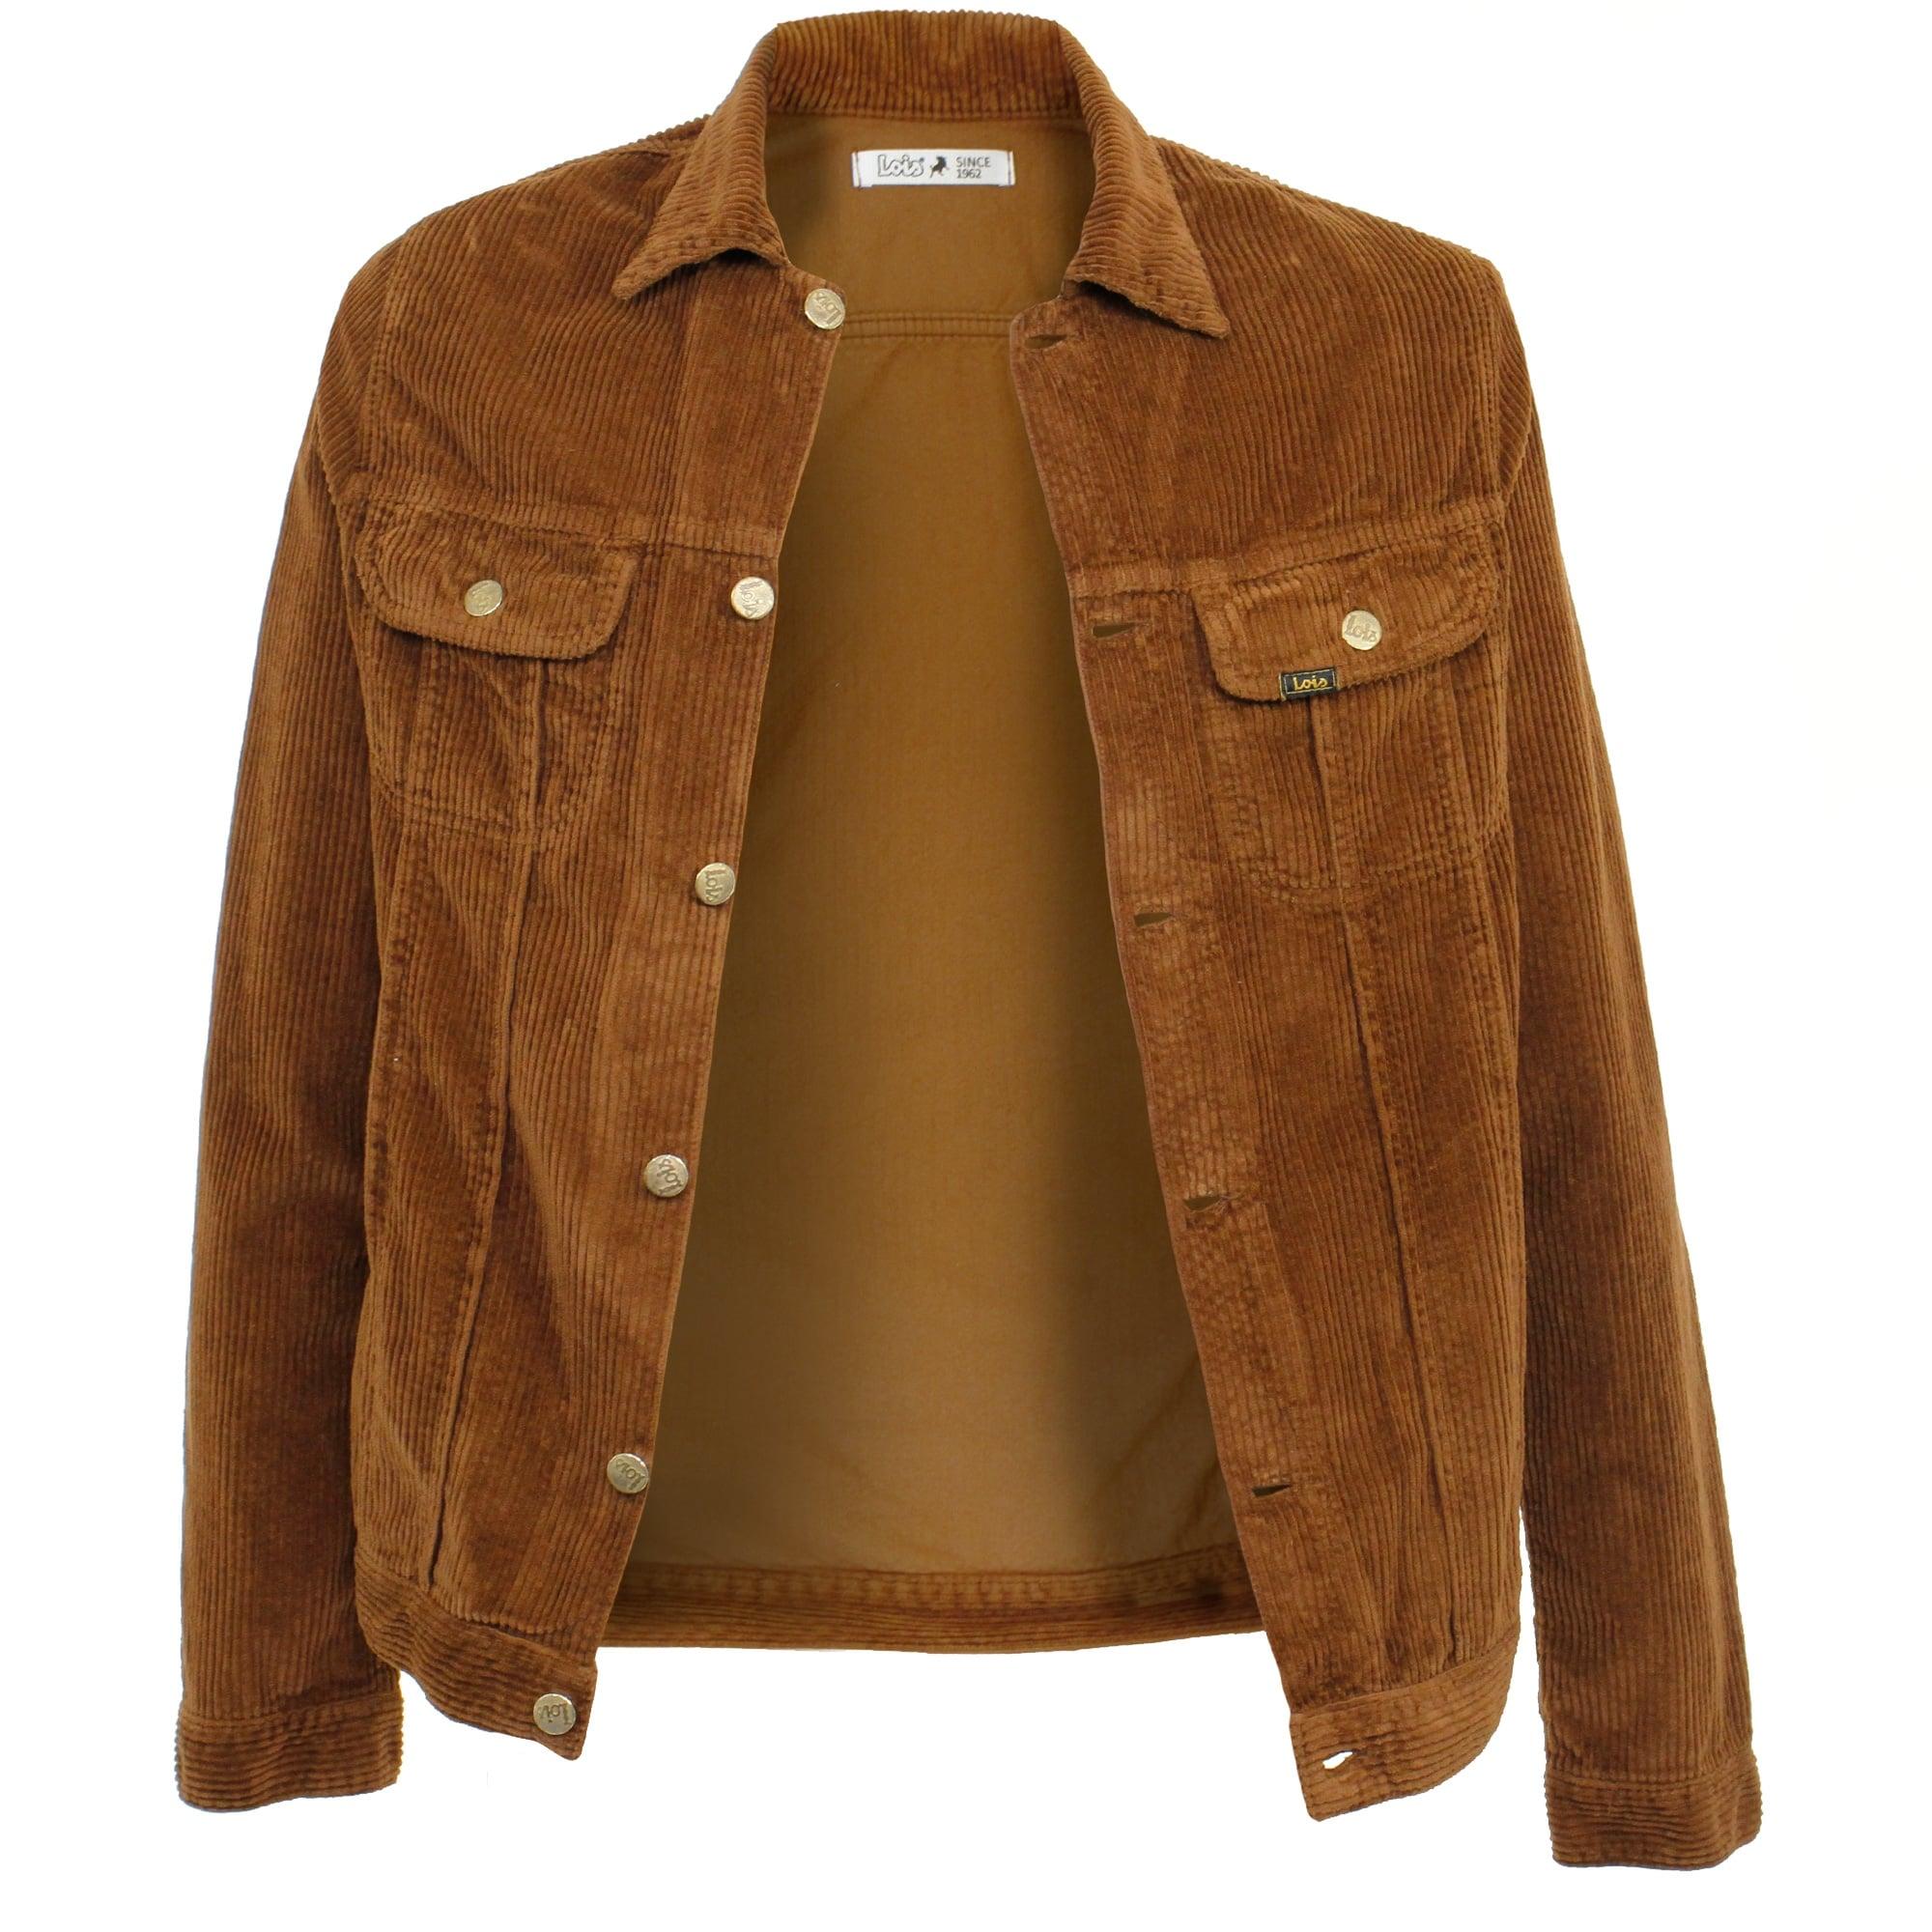 lois jeans jumbo cord brown corduroy jacket 1001394br loodthv